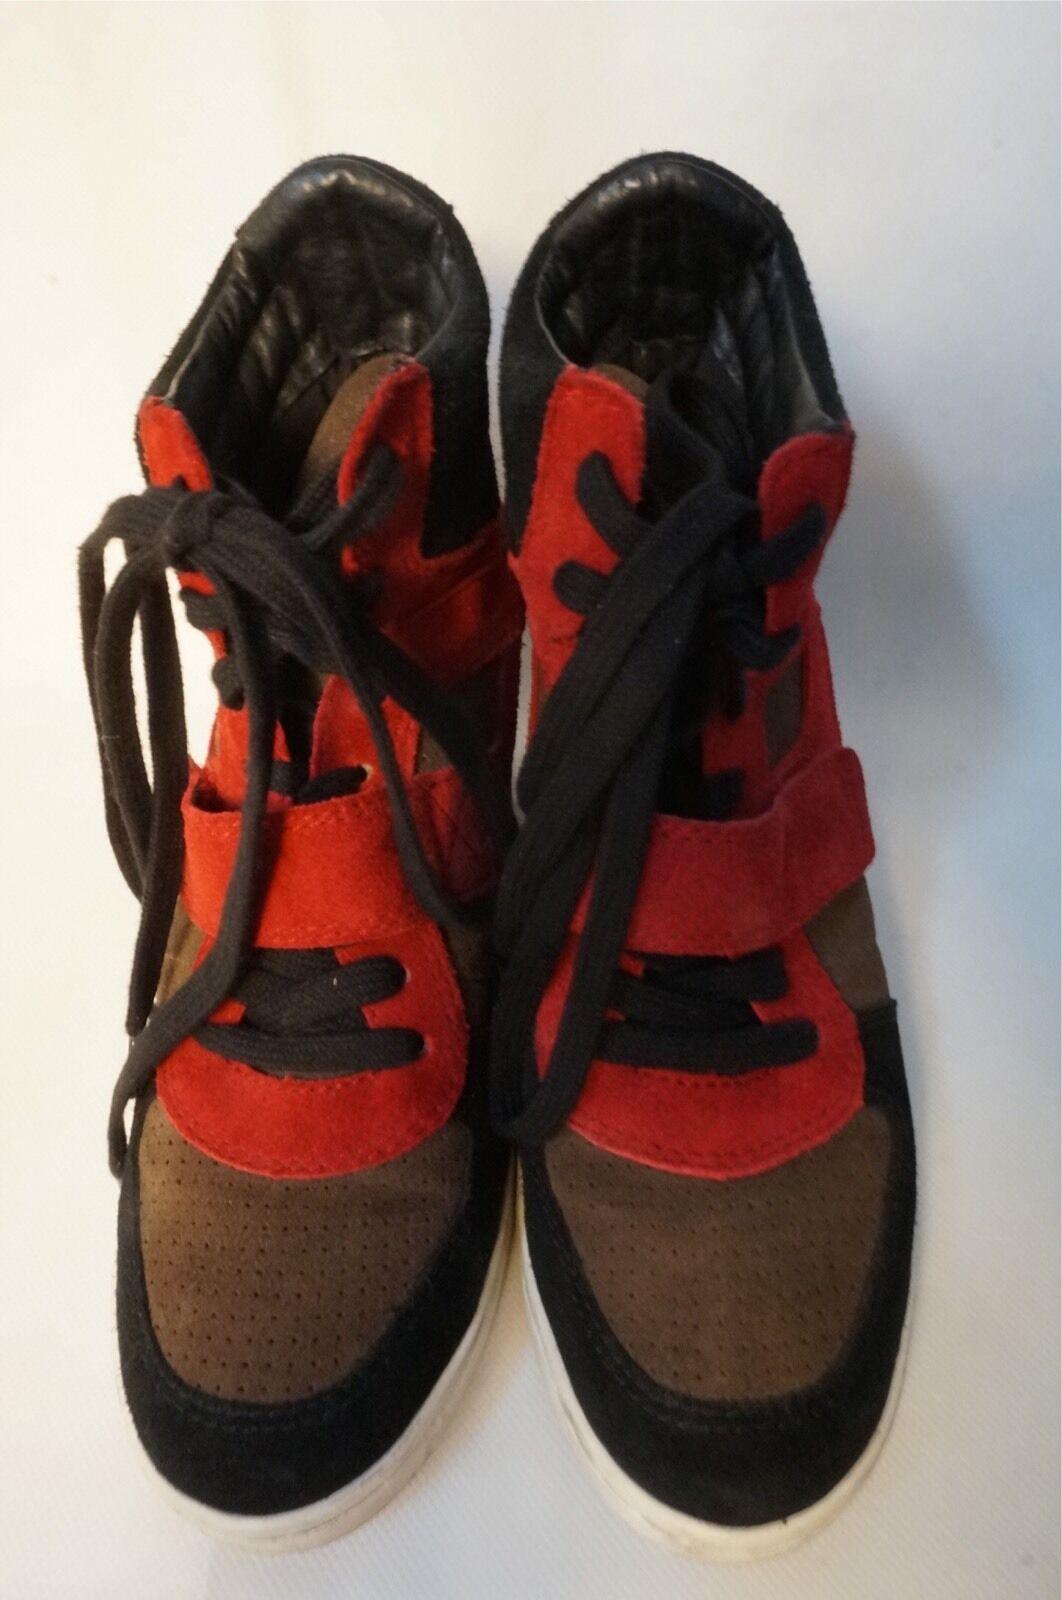 ASH Damen Schuhe Damen Sneakers Sneaker Wedges   Limitert   Größe : 41